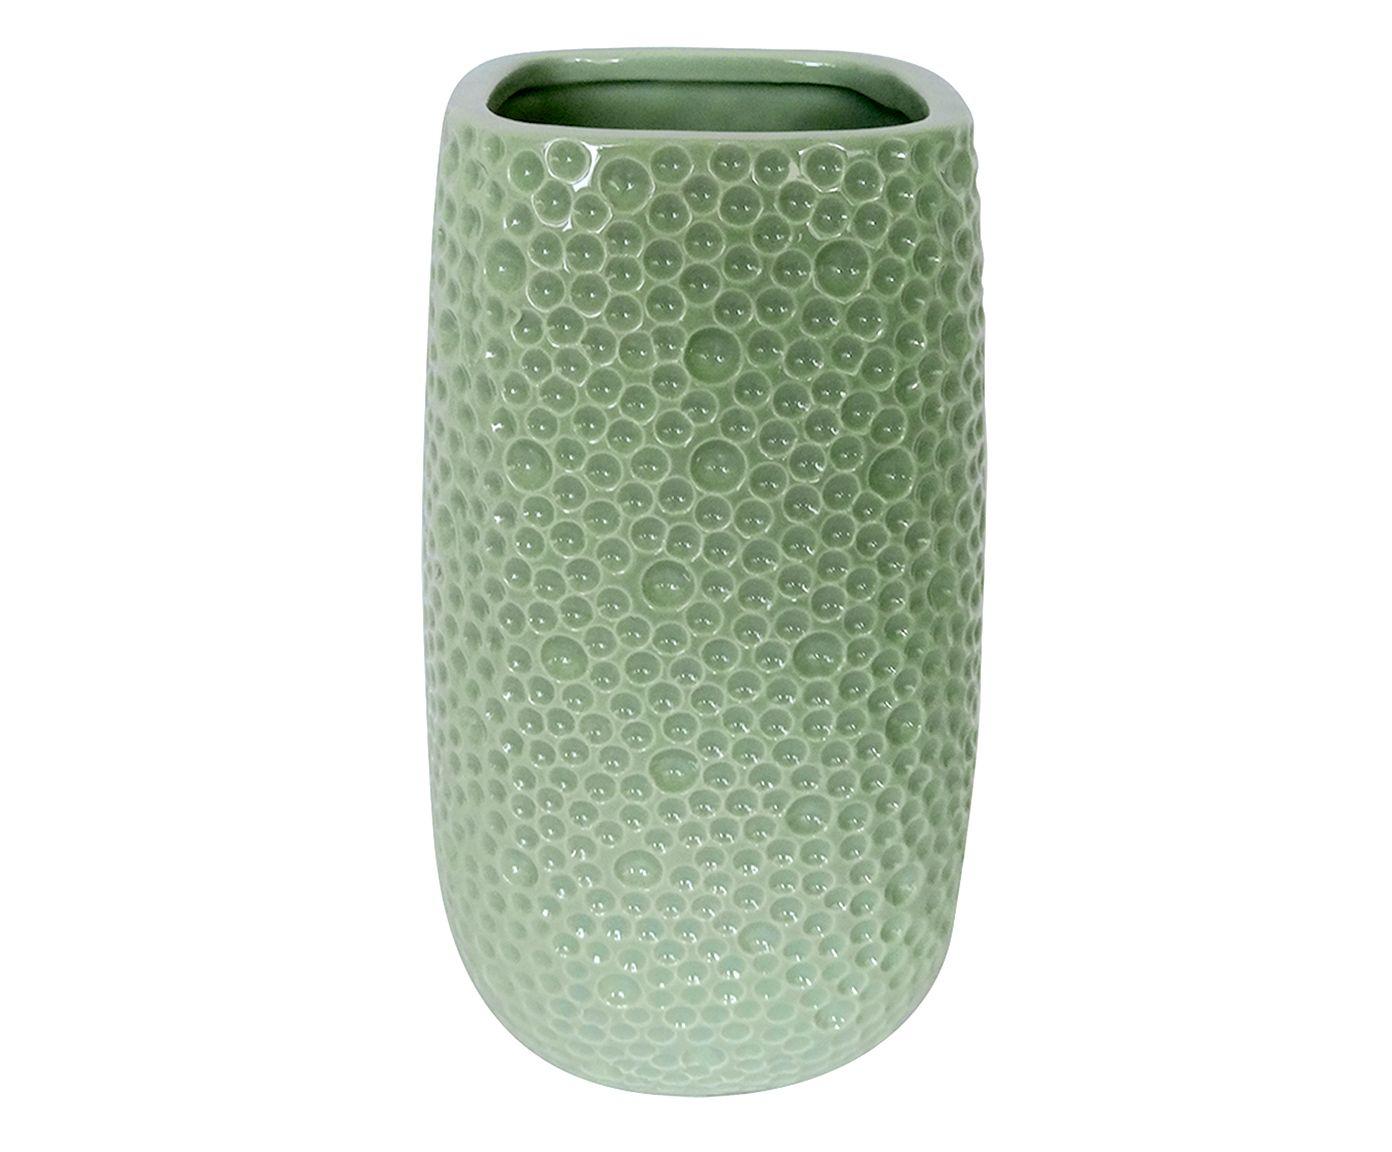 Vaso Ironsea Verde - 23X13,5cm | Westwing.com.br